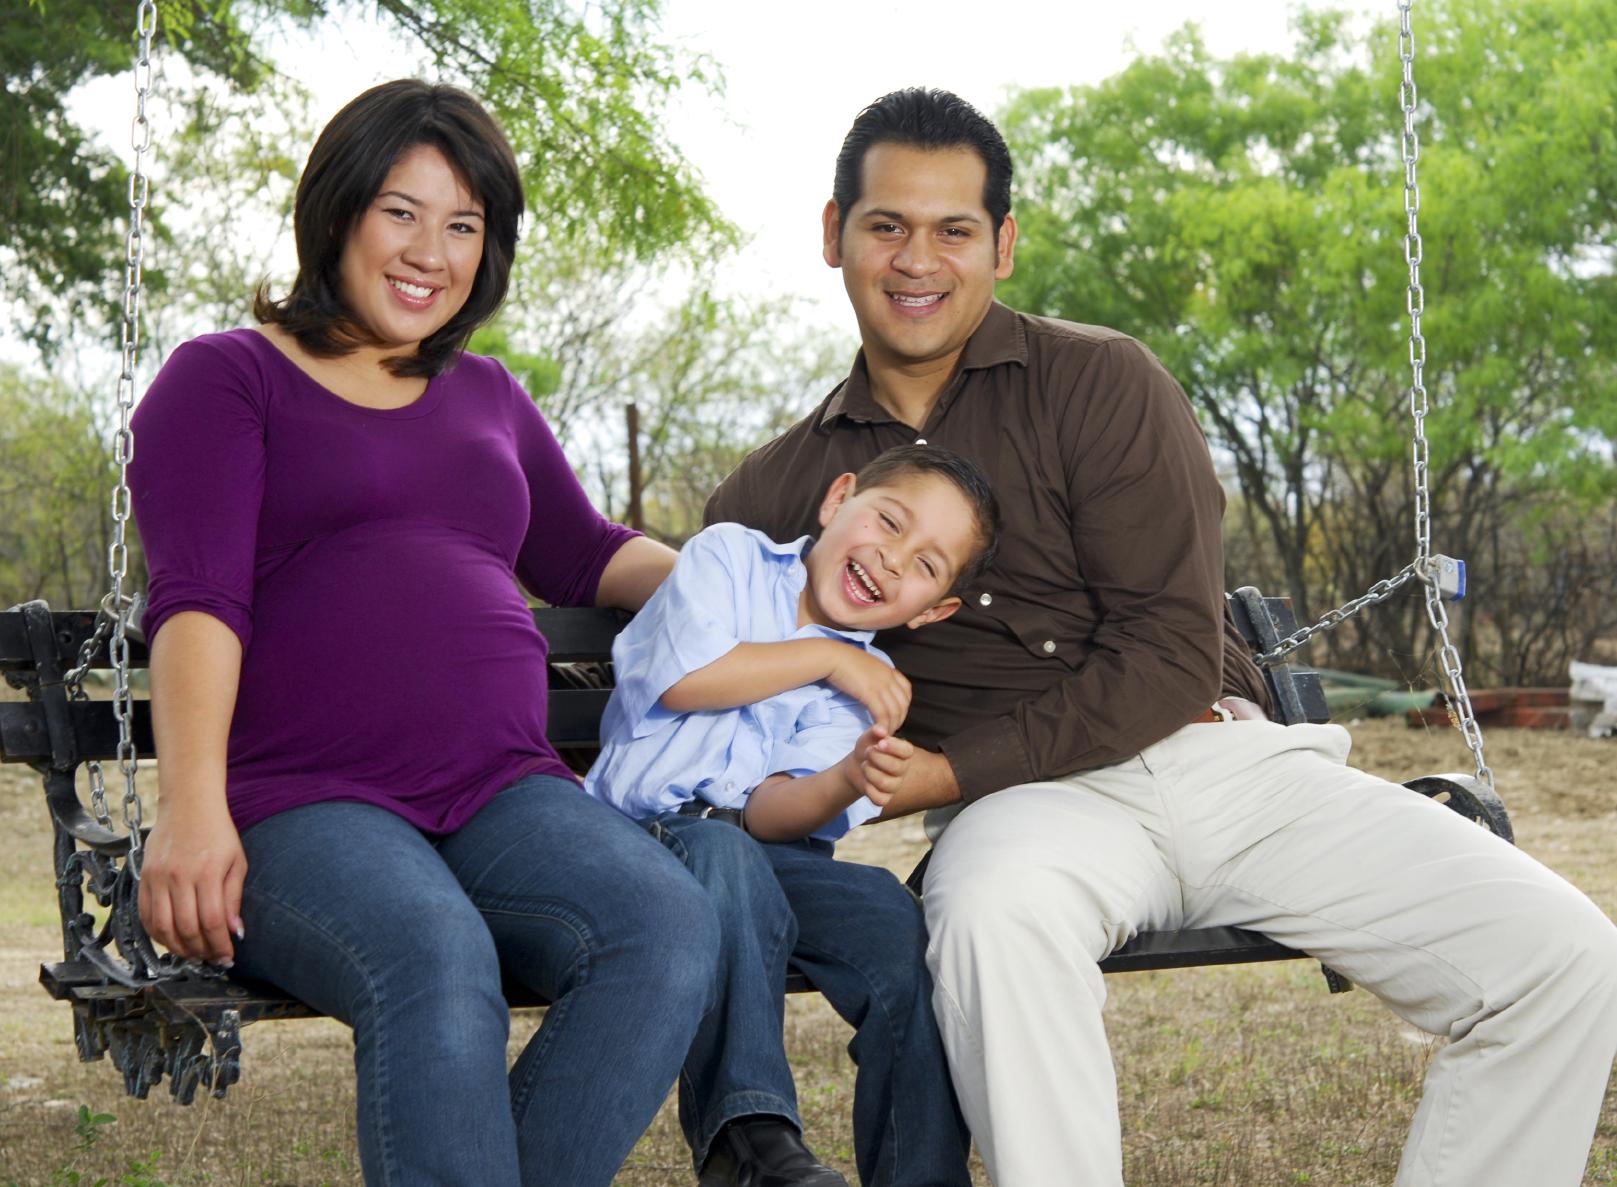 iStock_000009006529Medium family